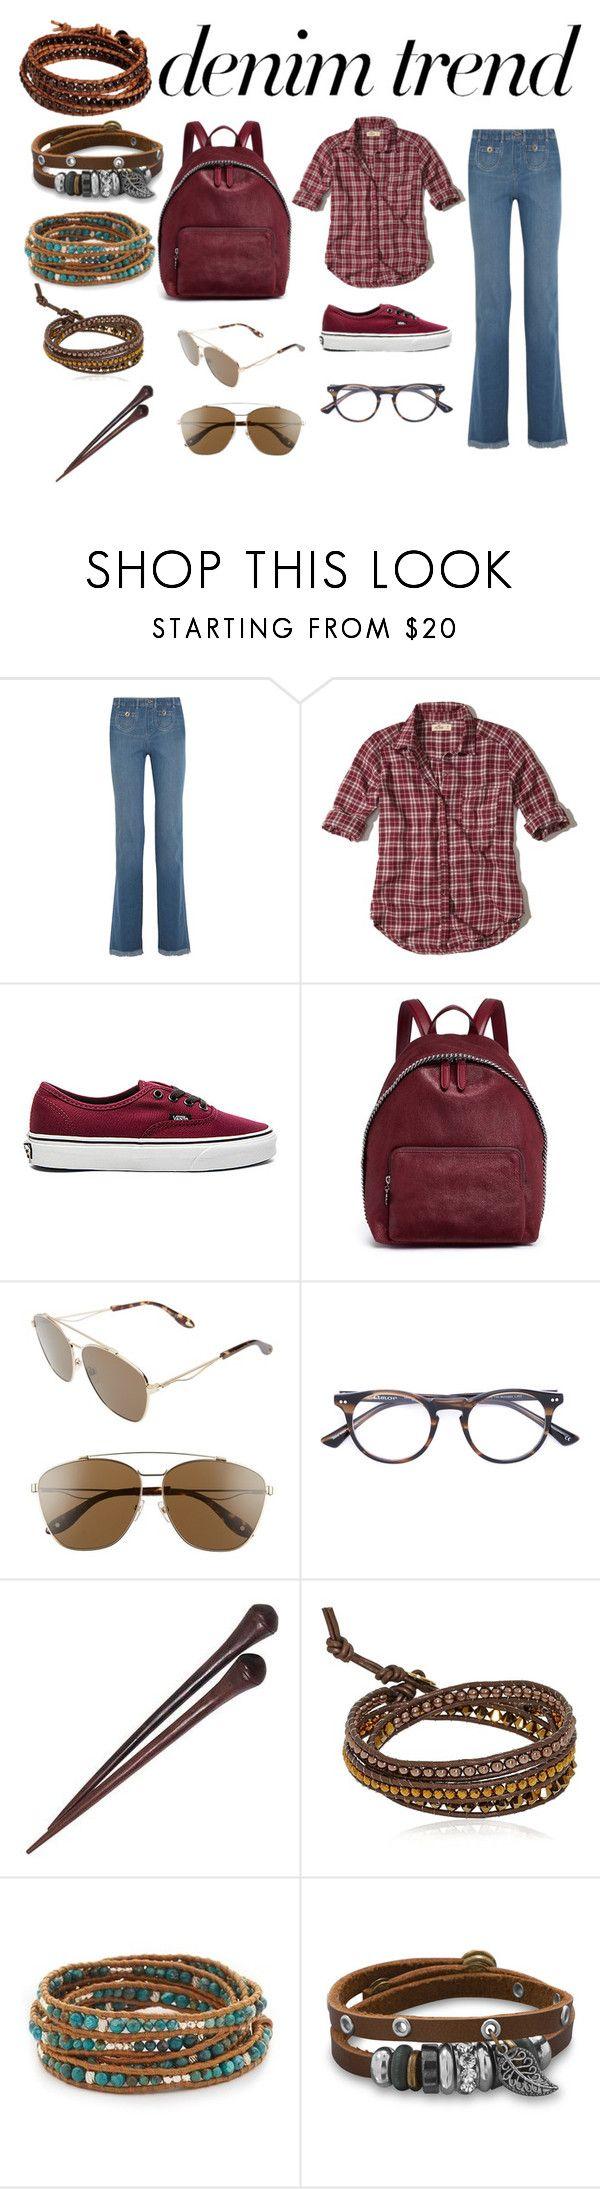 """wide leg jeans"" by sveta93 on Polyvore featuring moda, Chloé, Hollister Co., Vans, STELLA McCARTNEY, Givenchy, Sol-Amor, NOVICA, Colana e Chan Luu"